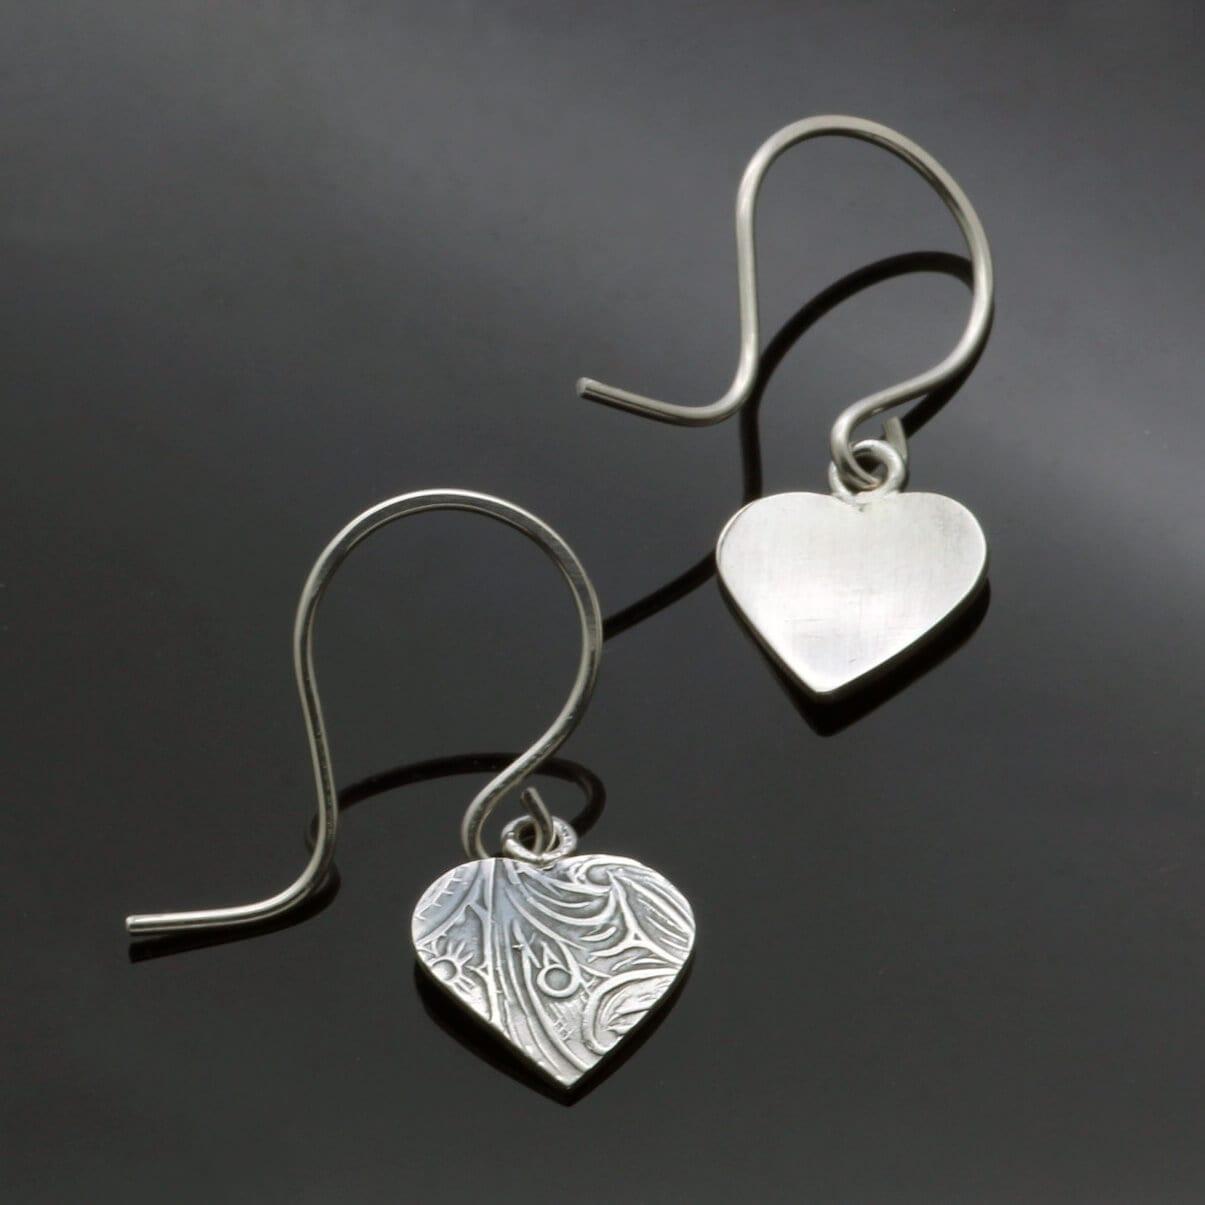 Modern Heart shaped Silver textured droplet earrings